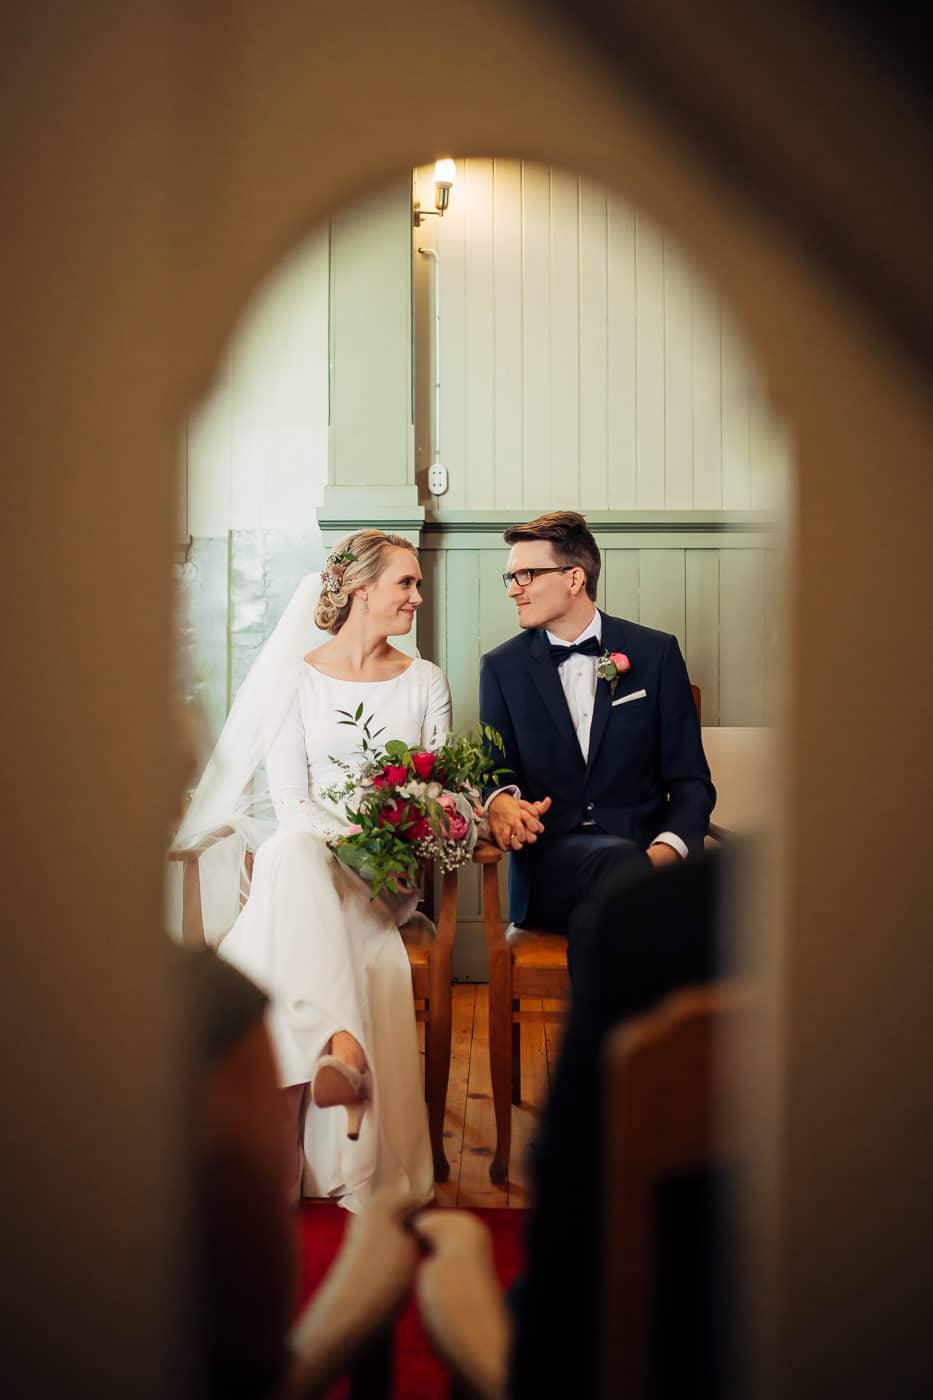 Karoline & Andreas - bryllup i Østfold med magiske detaljer Bryllup Fredrikstad Fotograf 24